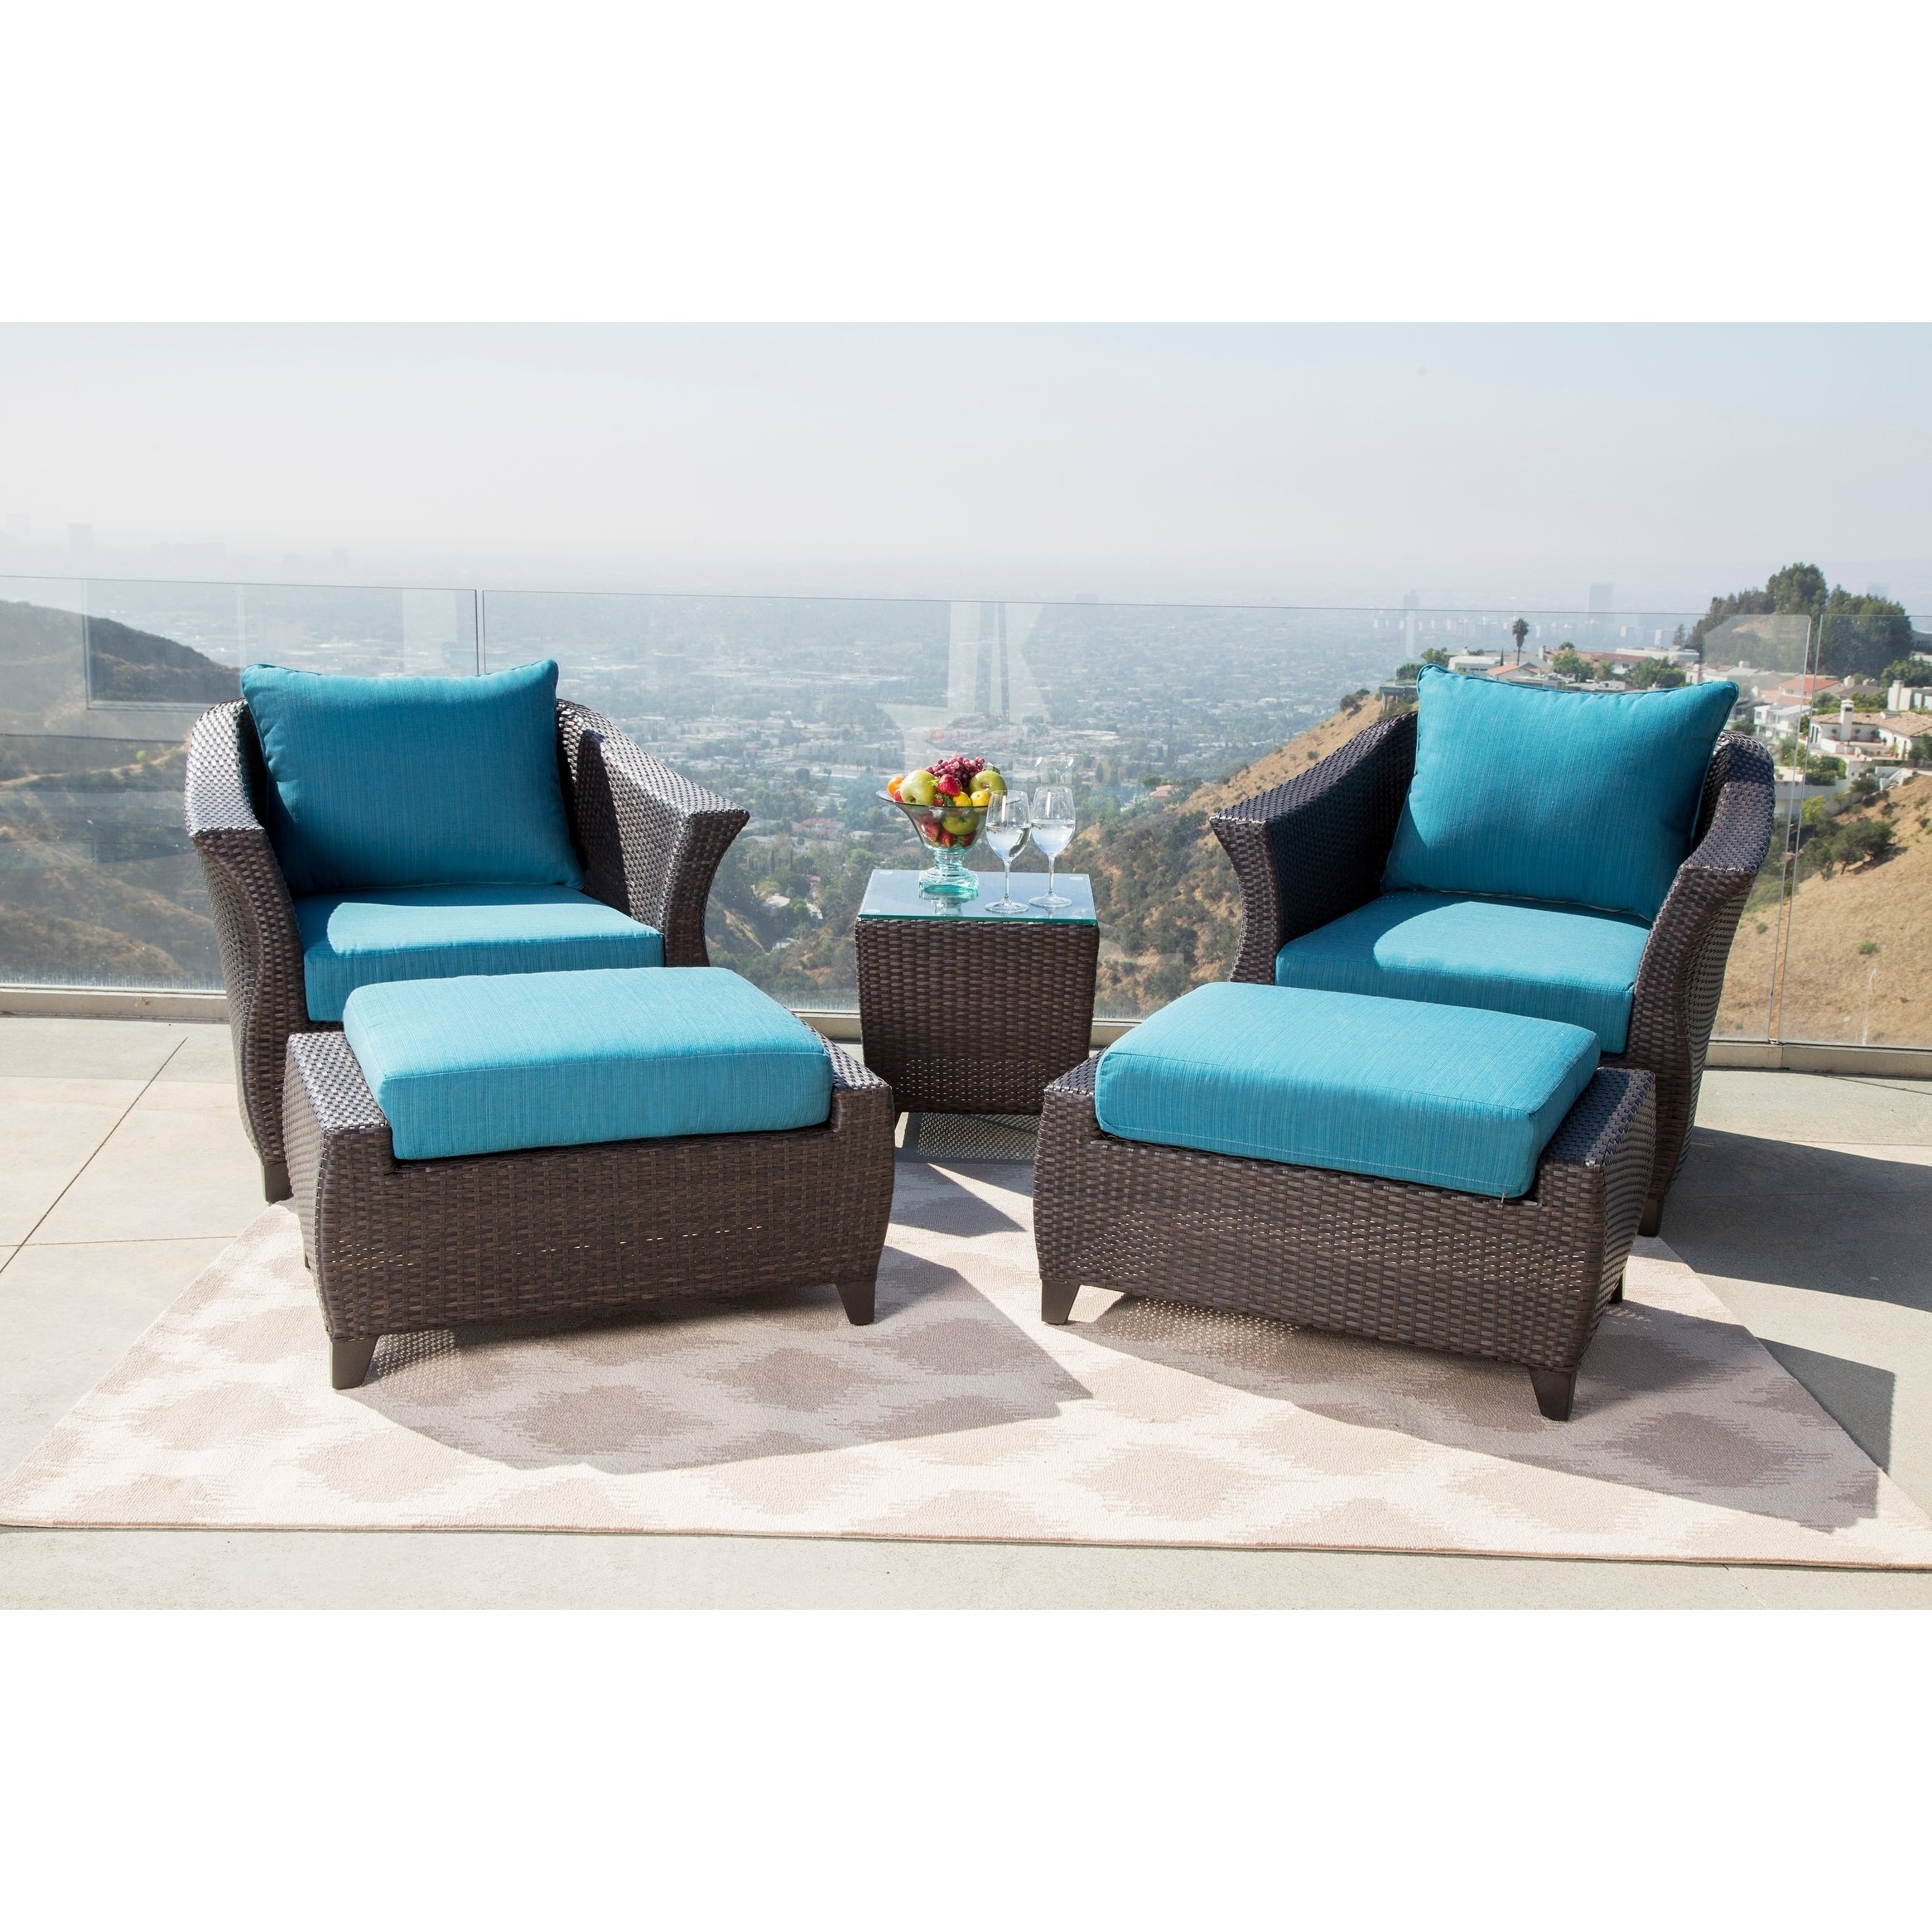 Abbyson Laguna Sunbrella Outdoor Wicker 5 Piece Patio Chair Set